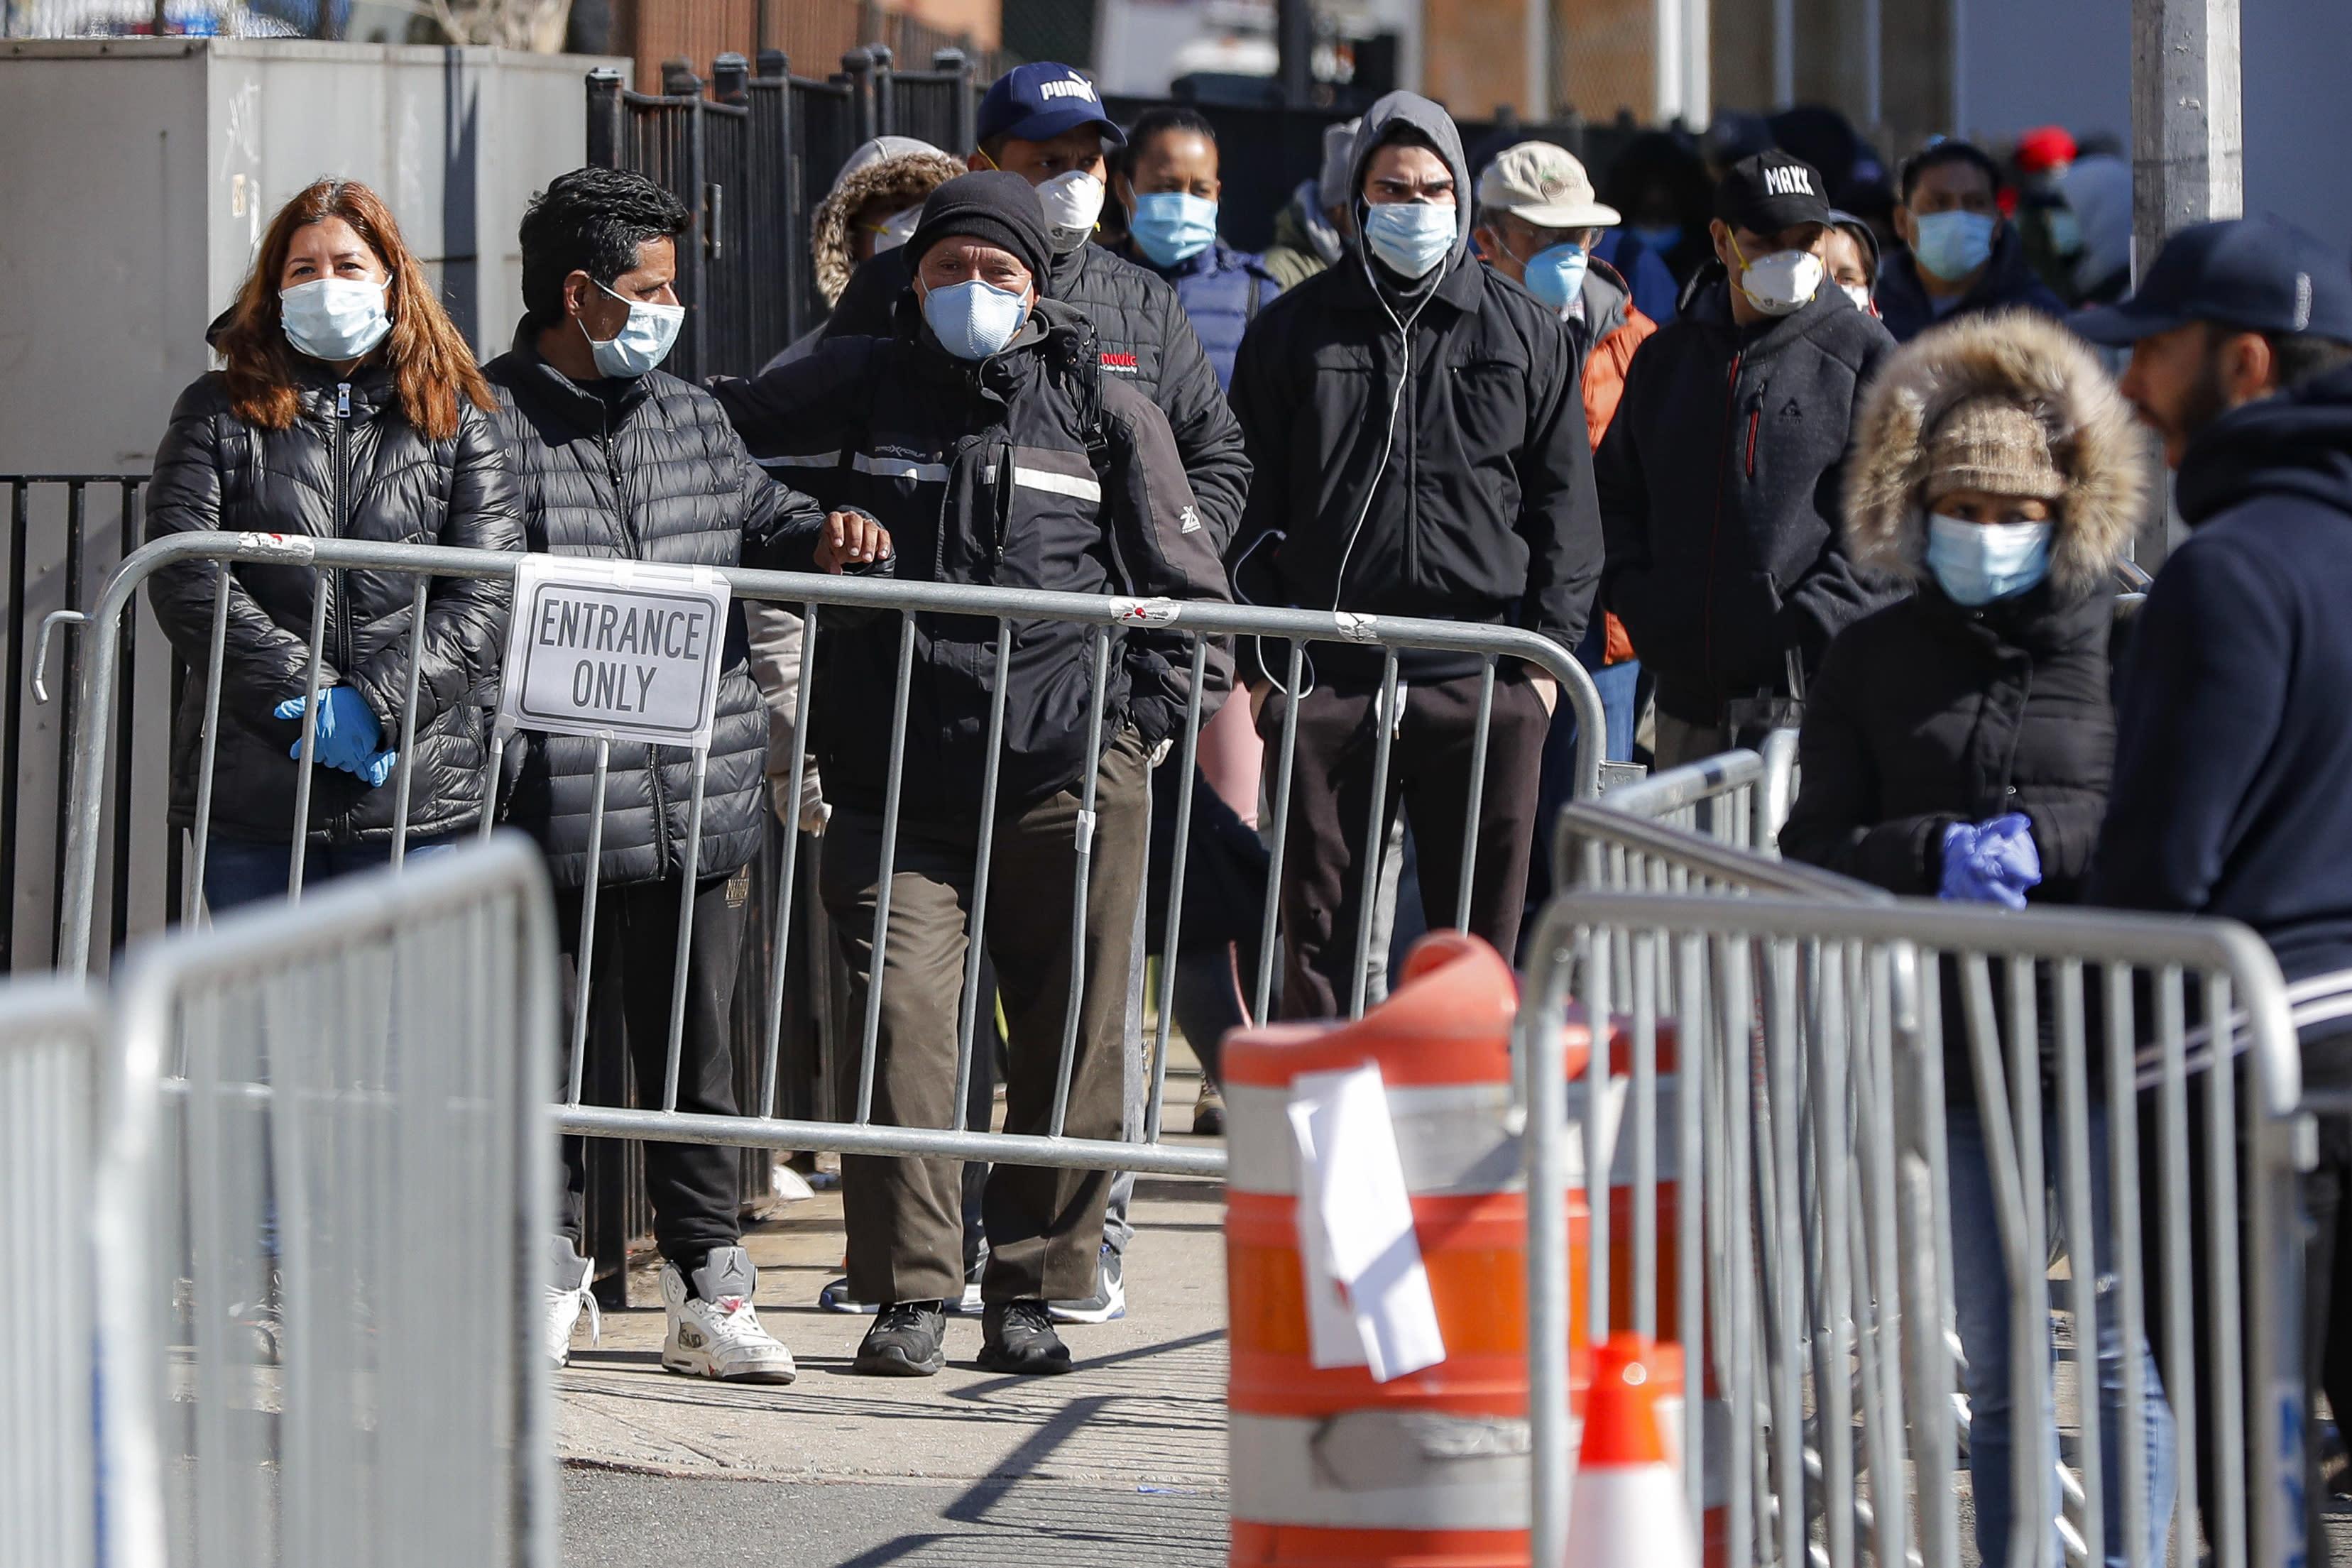 Health care professionals warn of coronavirus spread in more U.S. cities